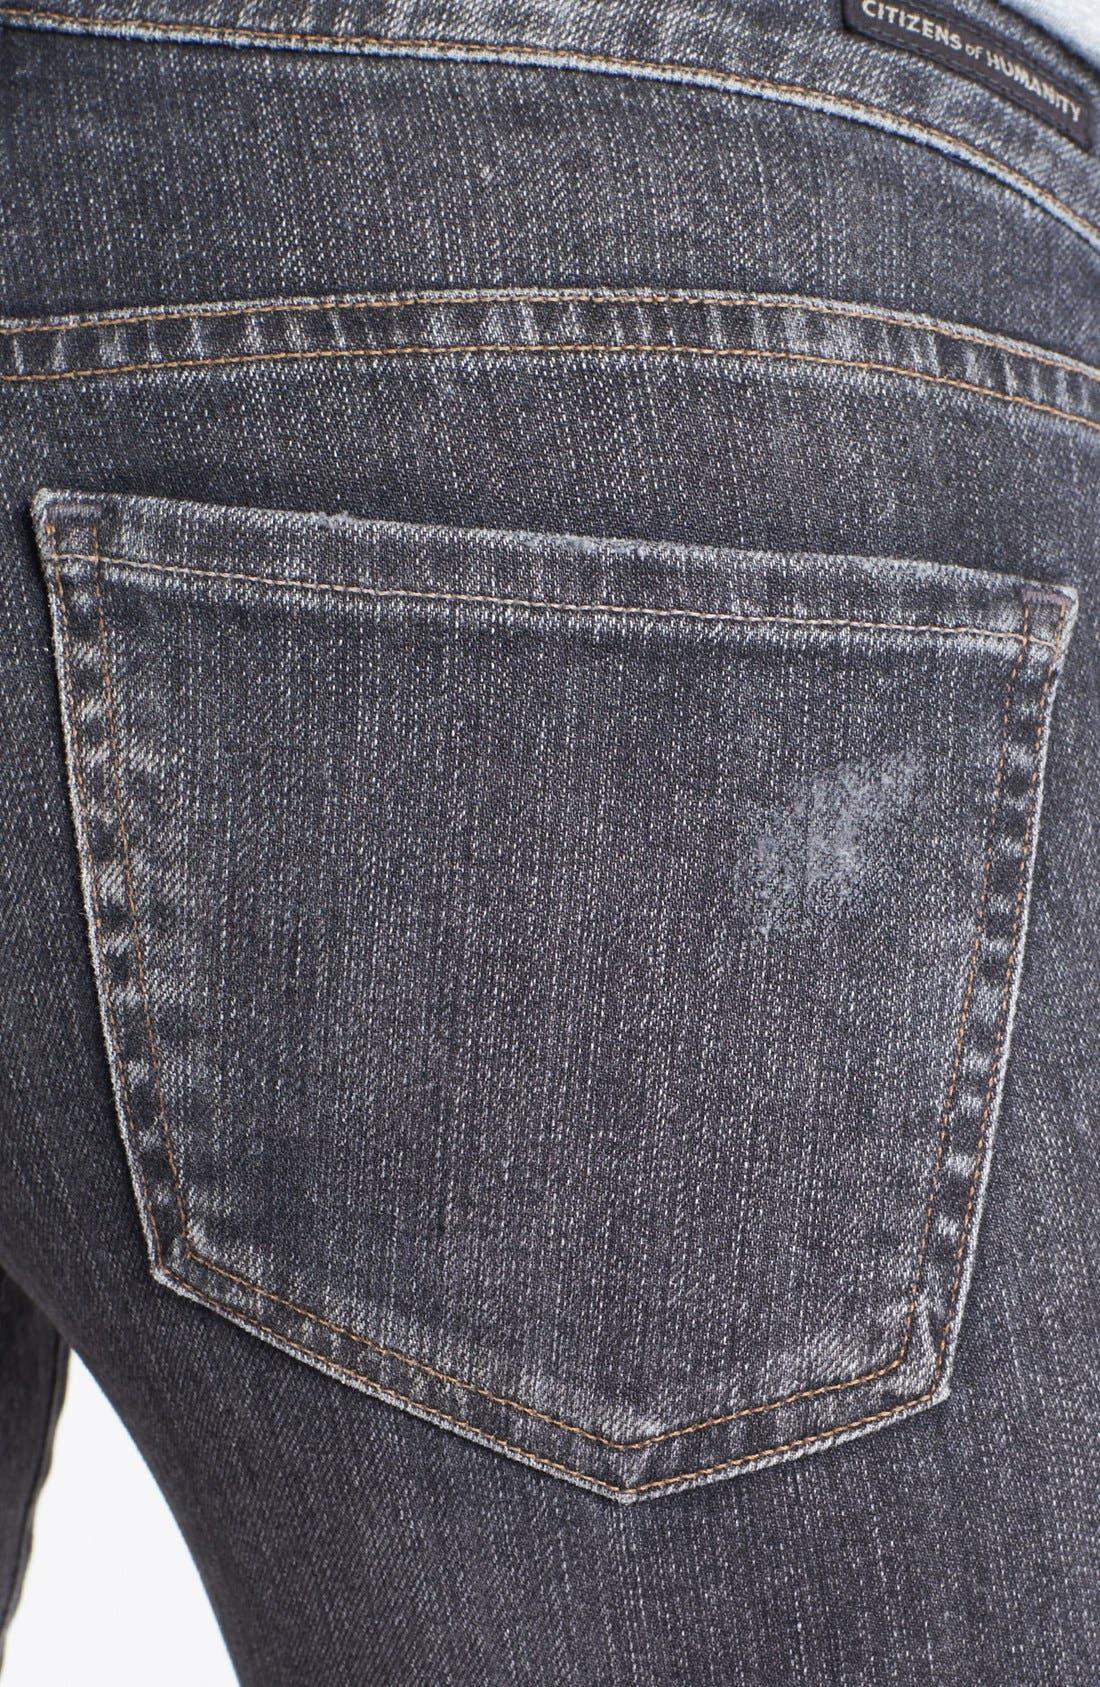 'Racer' Low Rise Skinny Jeans,                             Alternate thumbnail 4, color,                             026